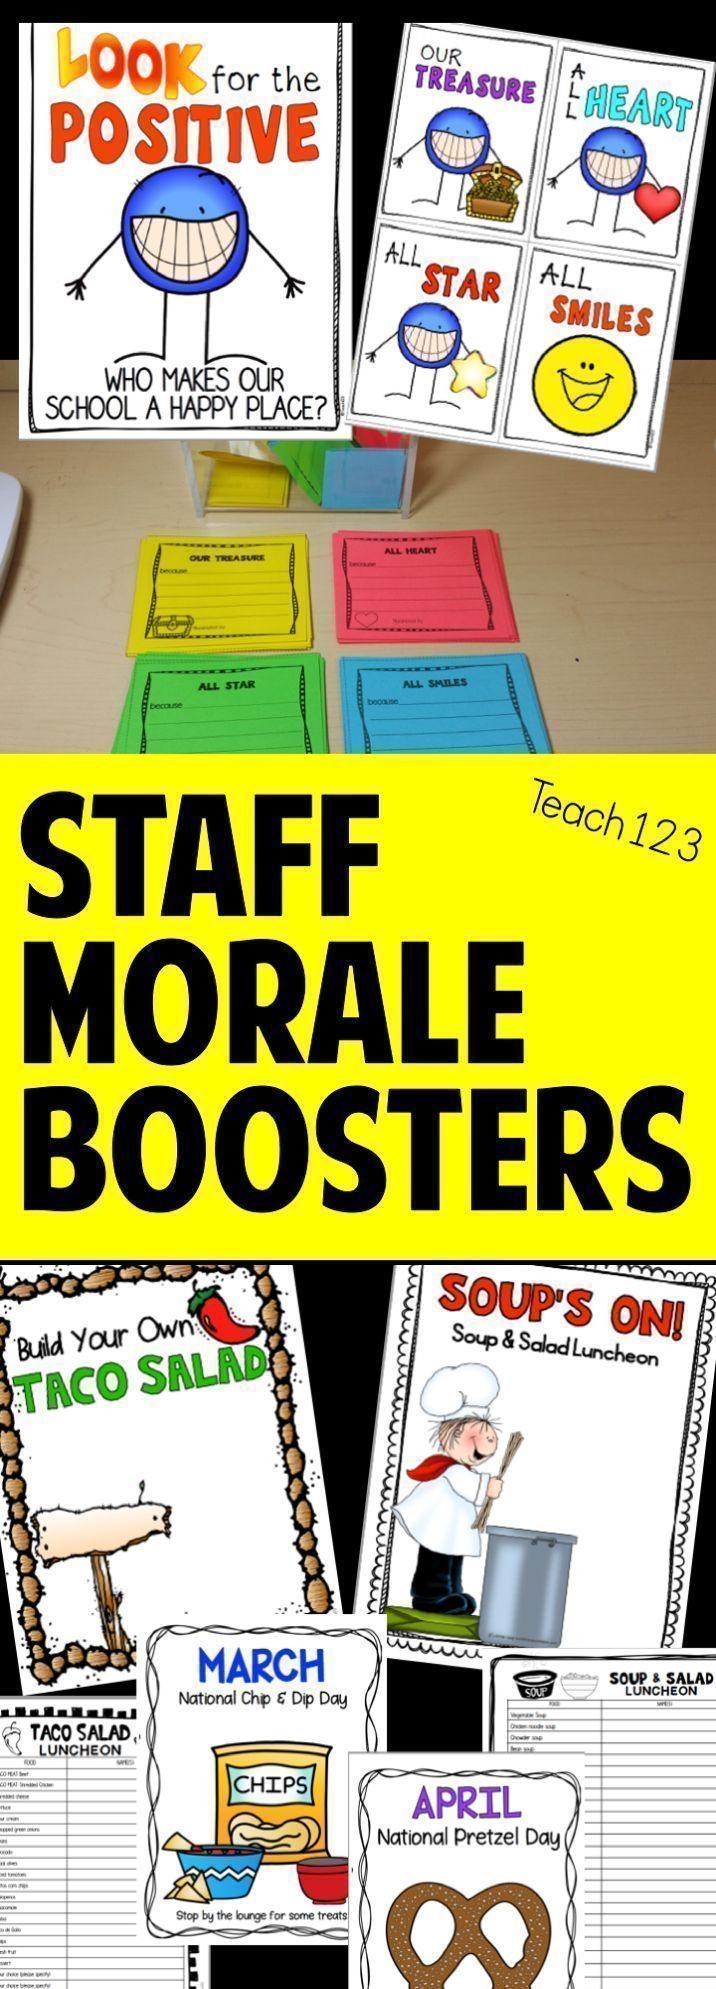 School Climate - Building Community | Staff appreciation, Teacher ...